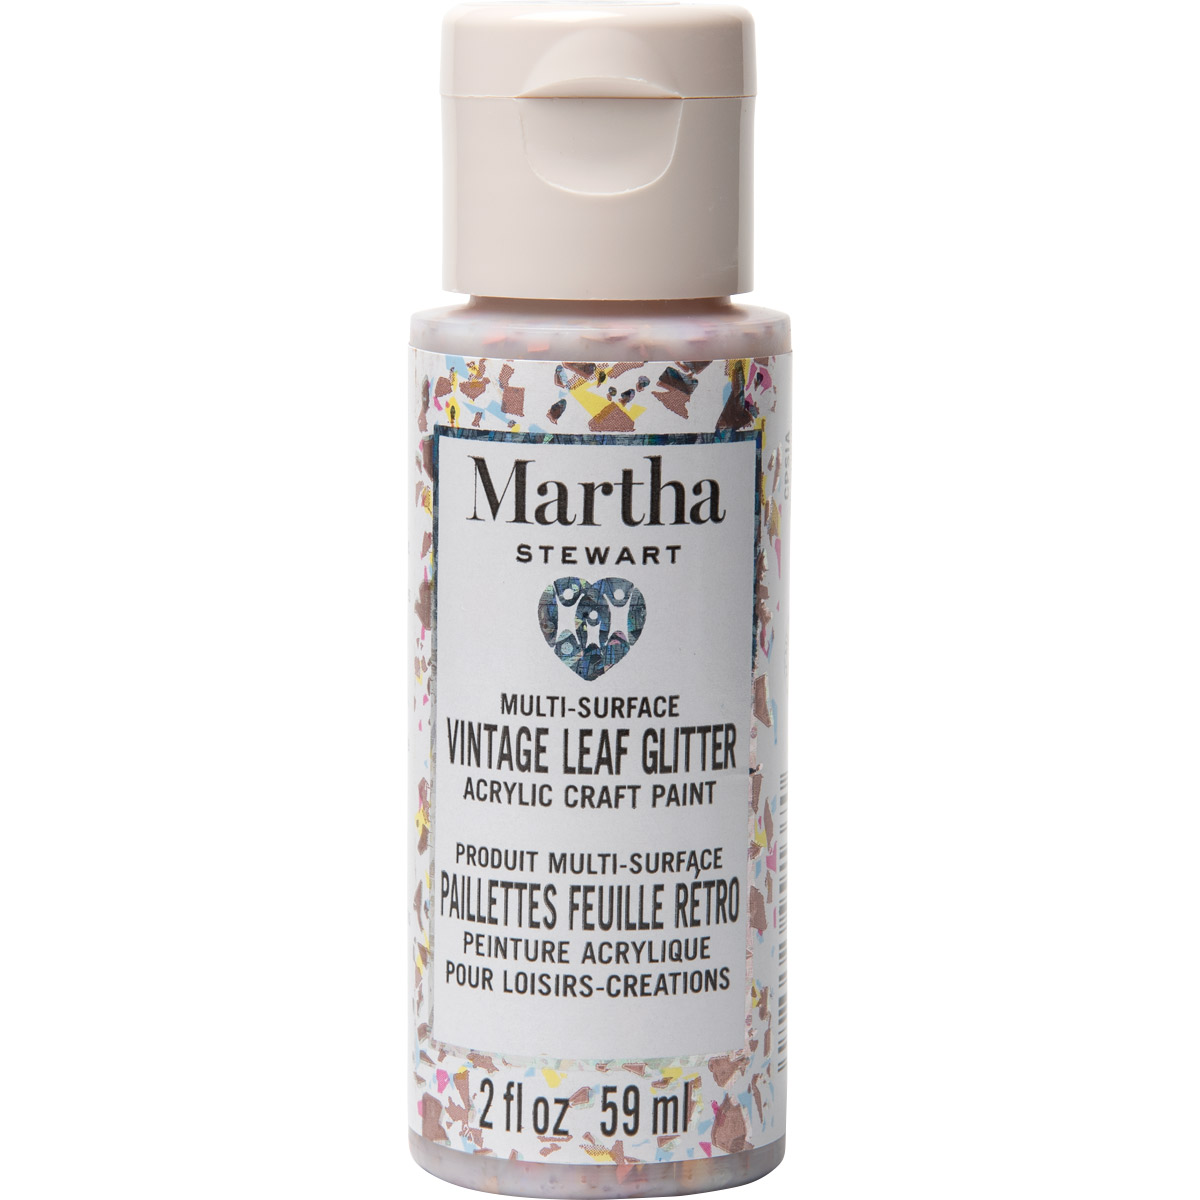 Martha Stewart® 2oz Multi-Surface Vintage Leaf Glitter Acrylic Craft Paint - Cotton Candy